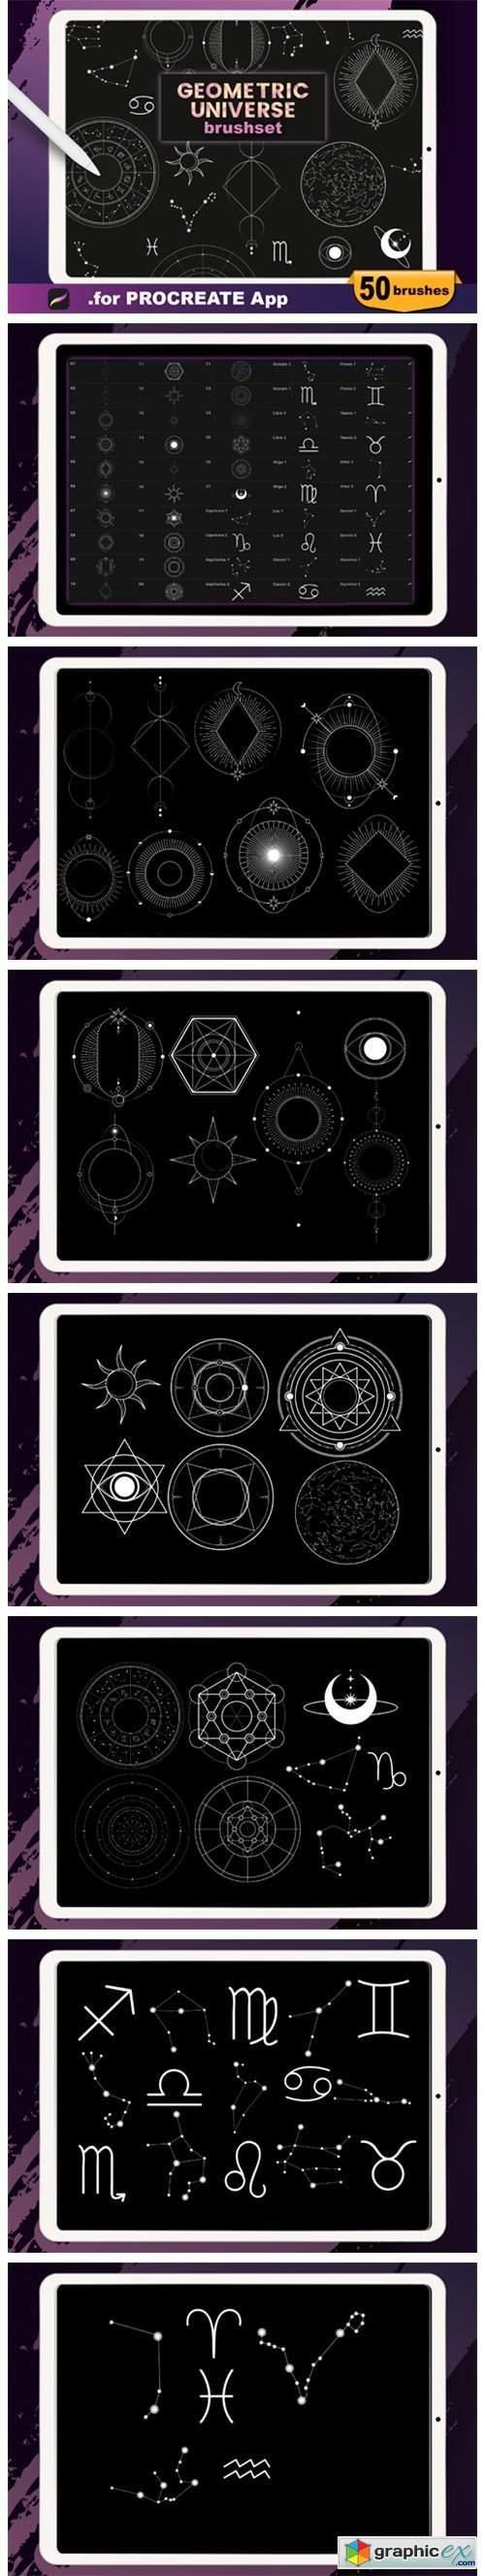 Procreate - Geometric Universe Stamps